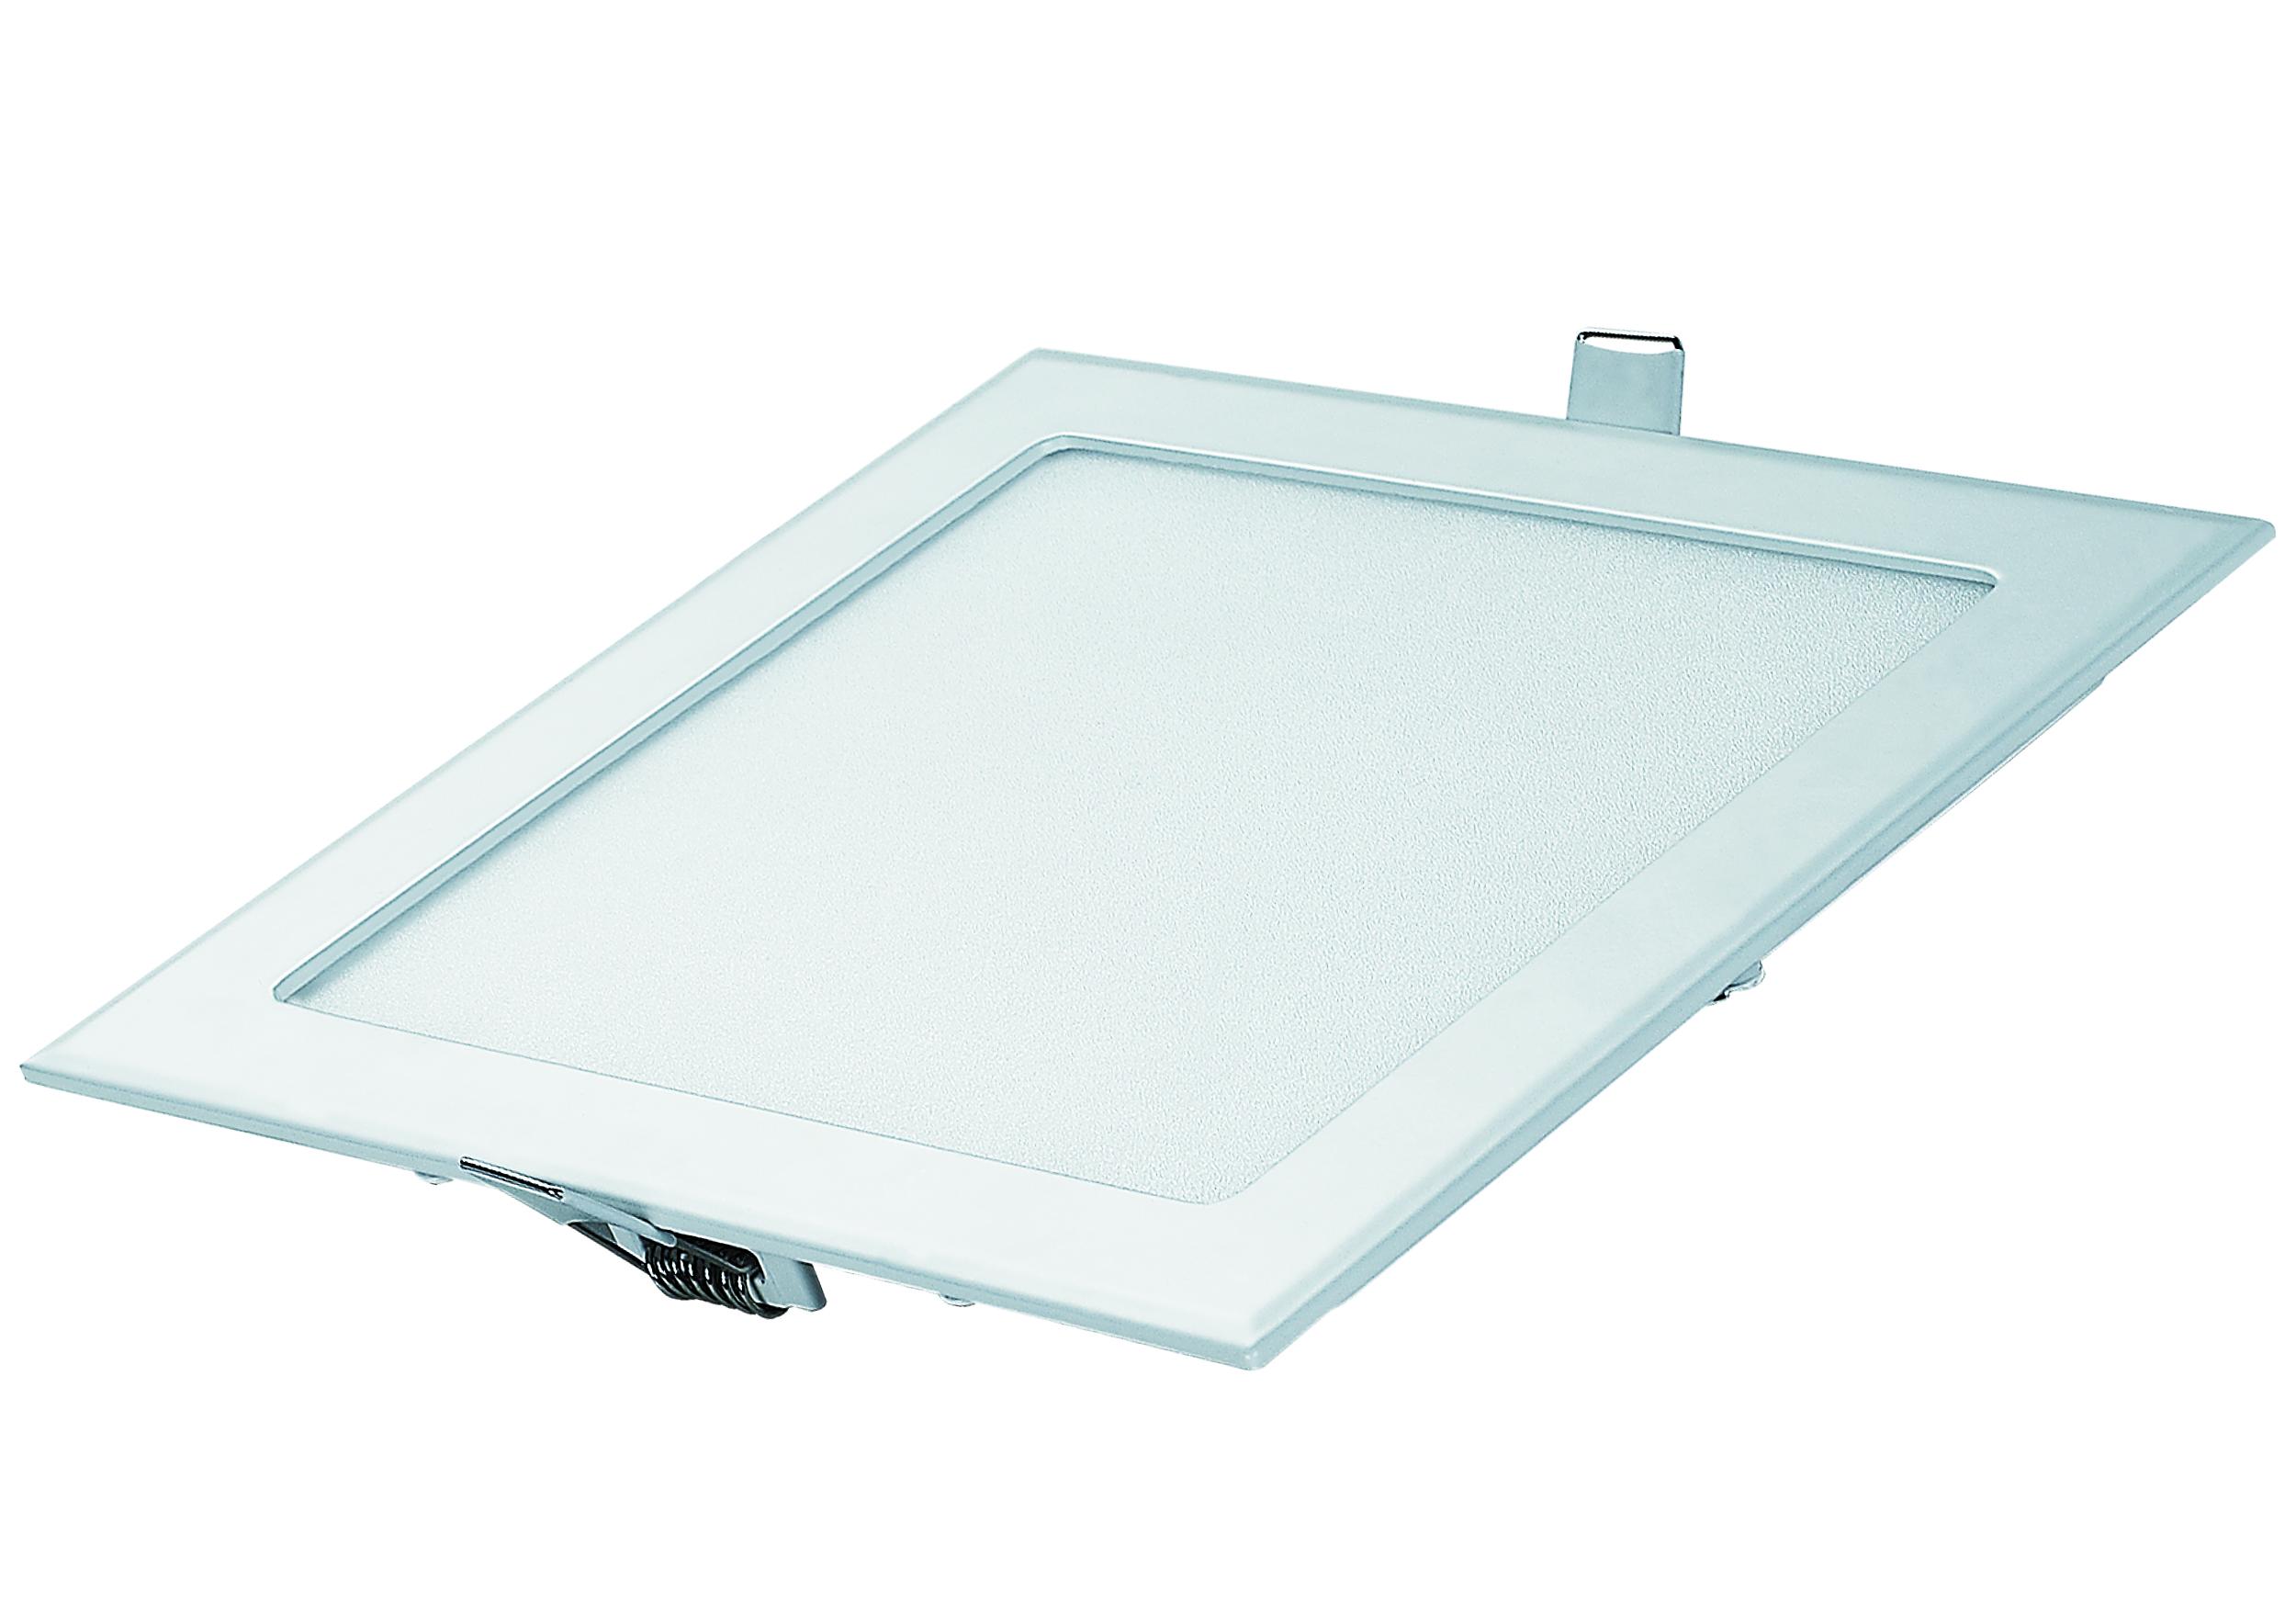 Turbo LED Einbau-Panel 8,5cm neutralweiss VP91